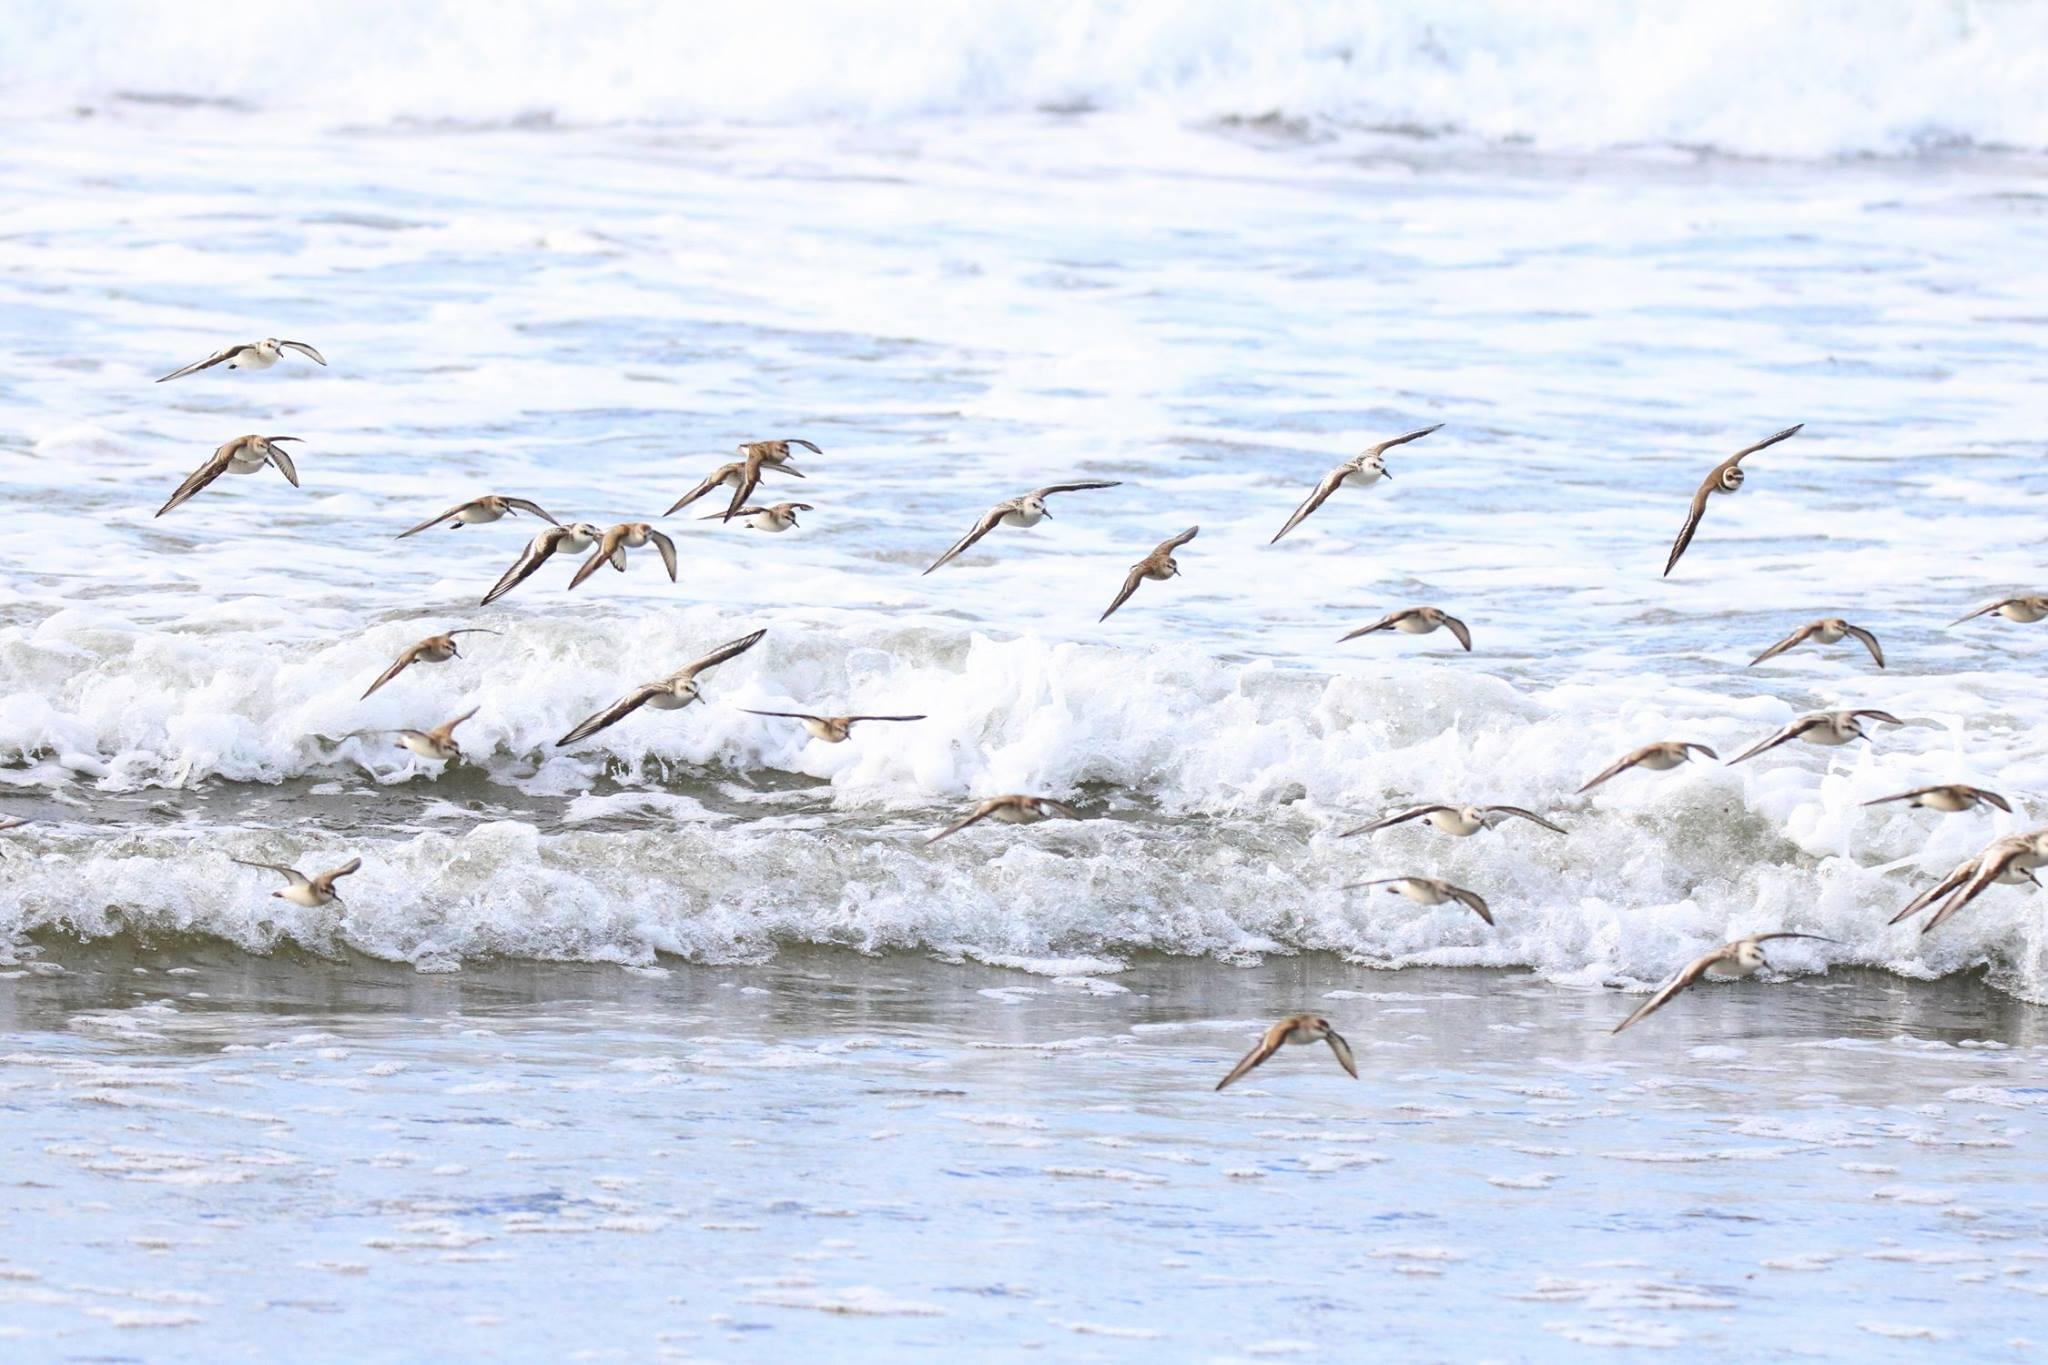 Shorebirds in the surf.